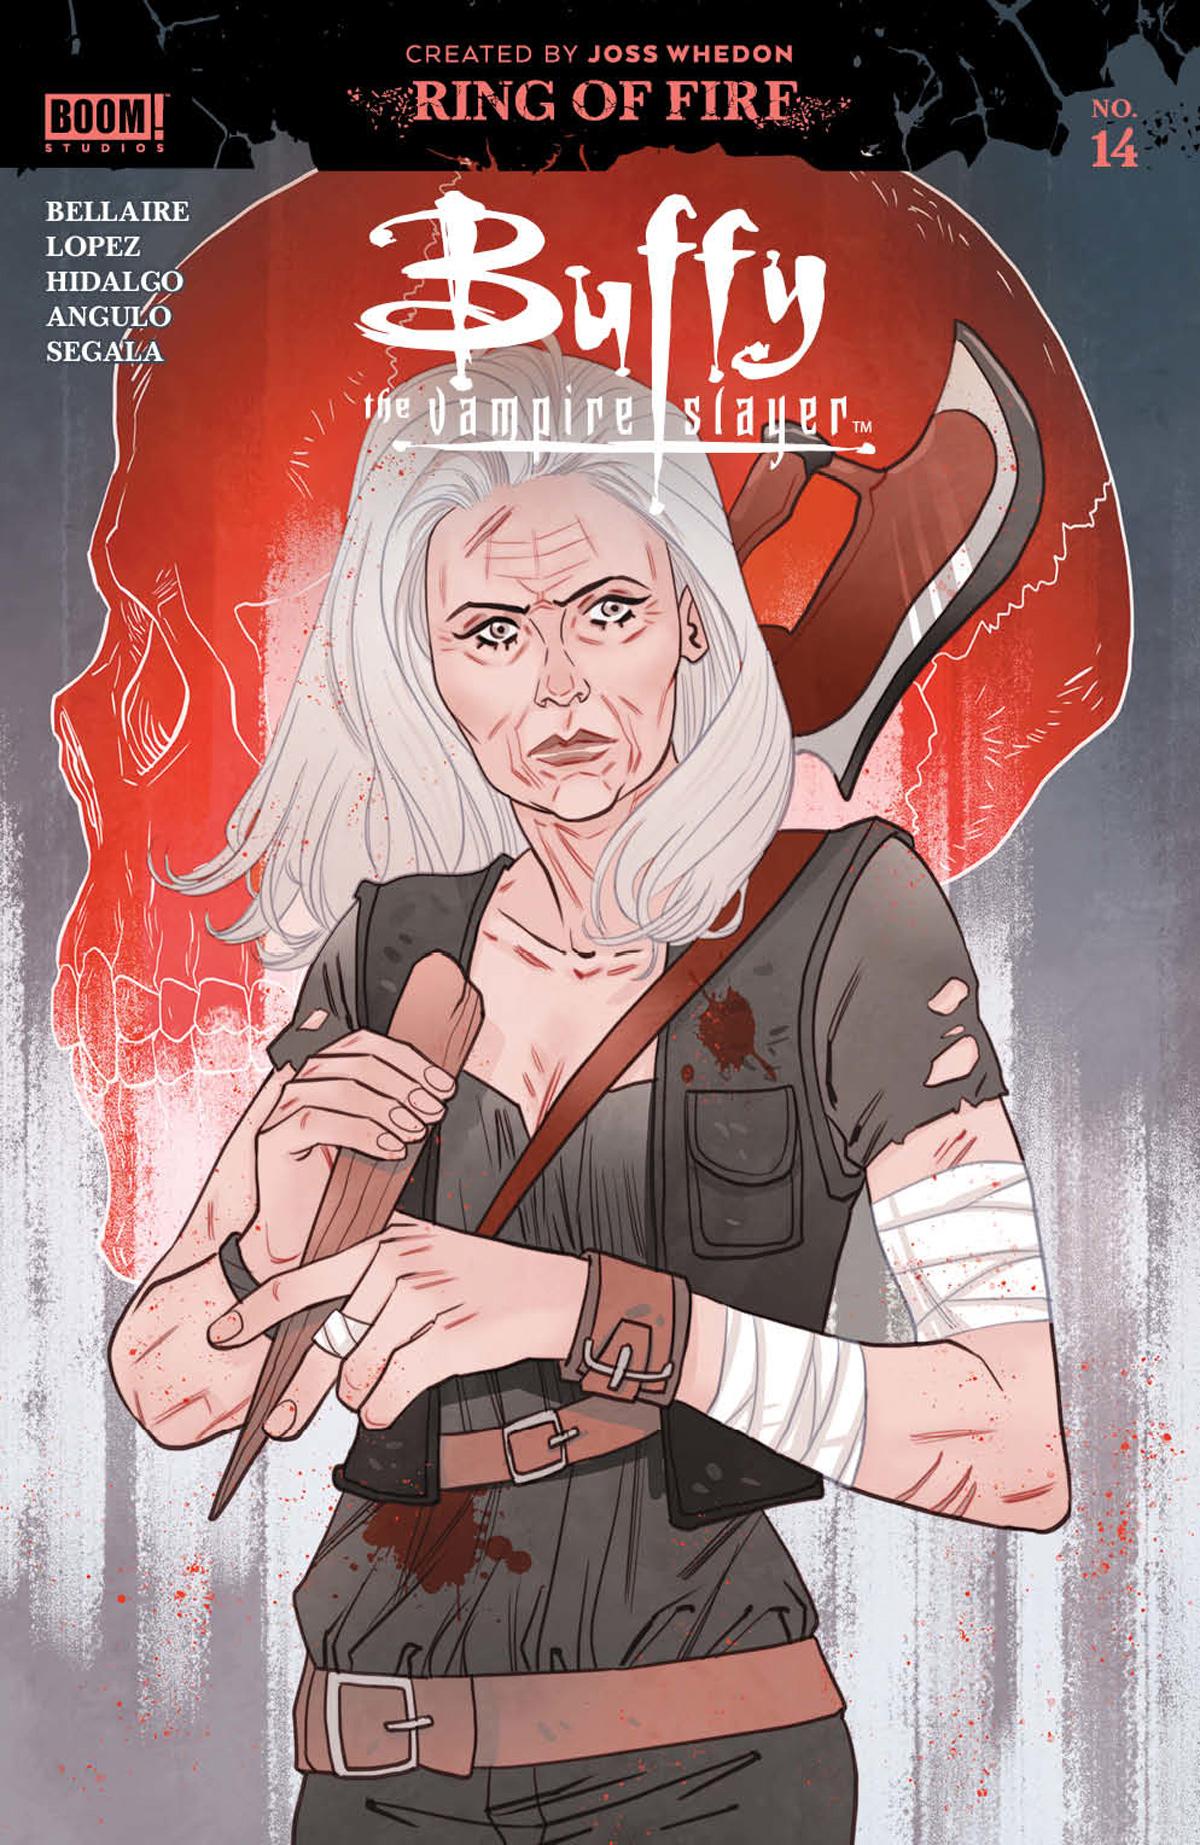 Buffy The Vampire Slayer Vol 2 #14 Cover B Variant Marguerite Sauvage Spotlight Cover